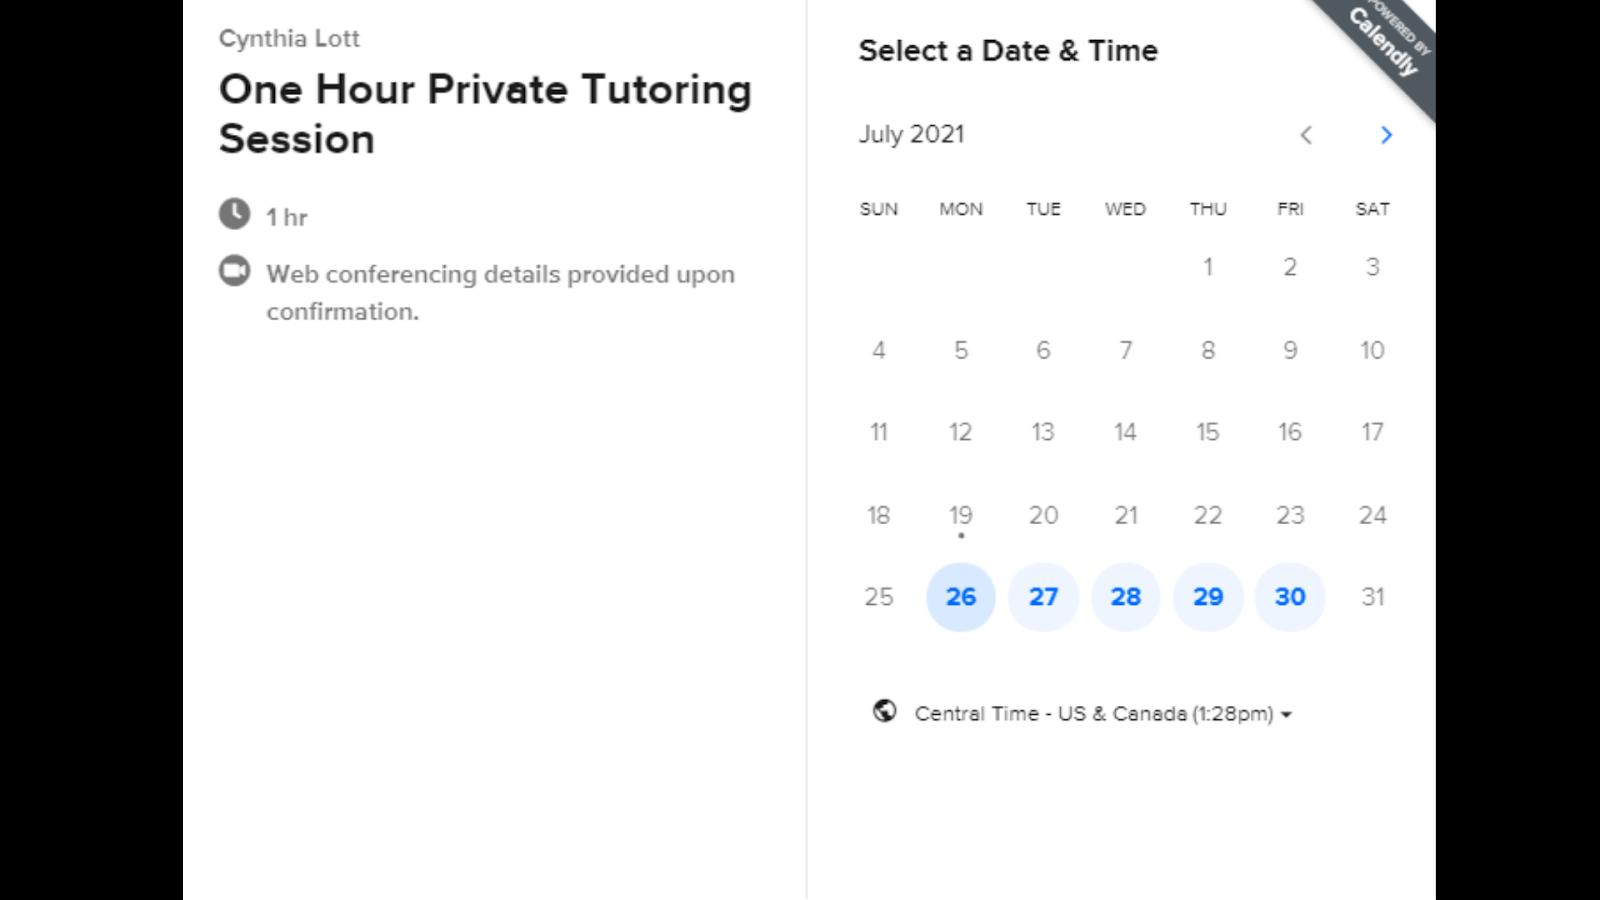 tutoring credit on prepagent